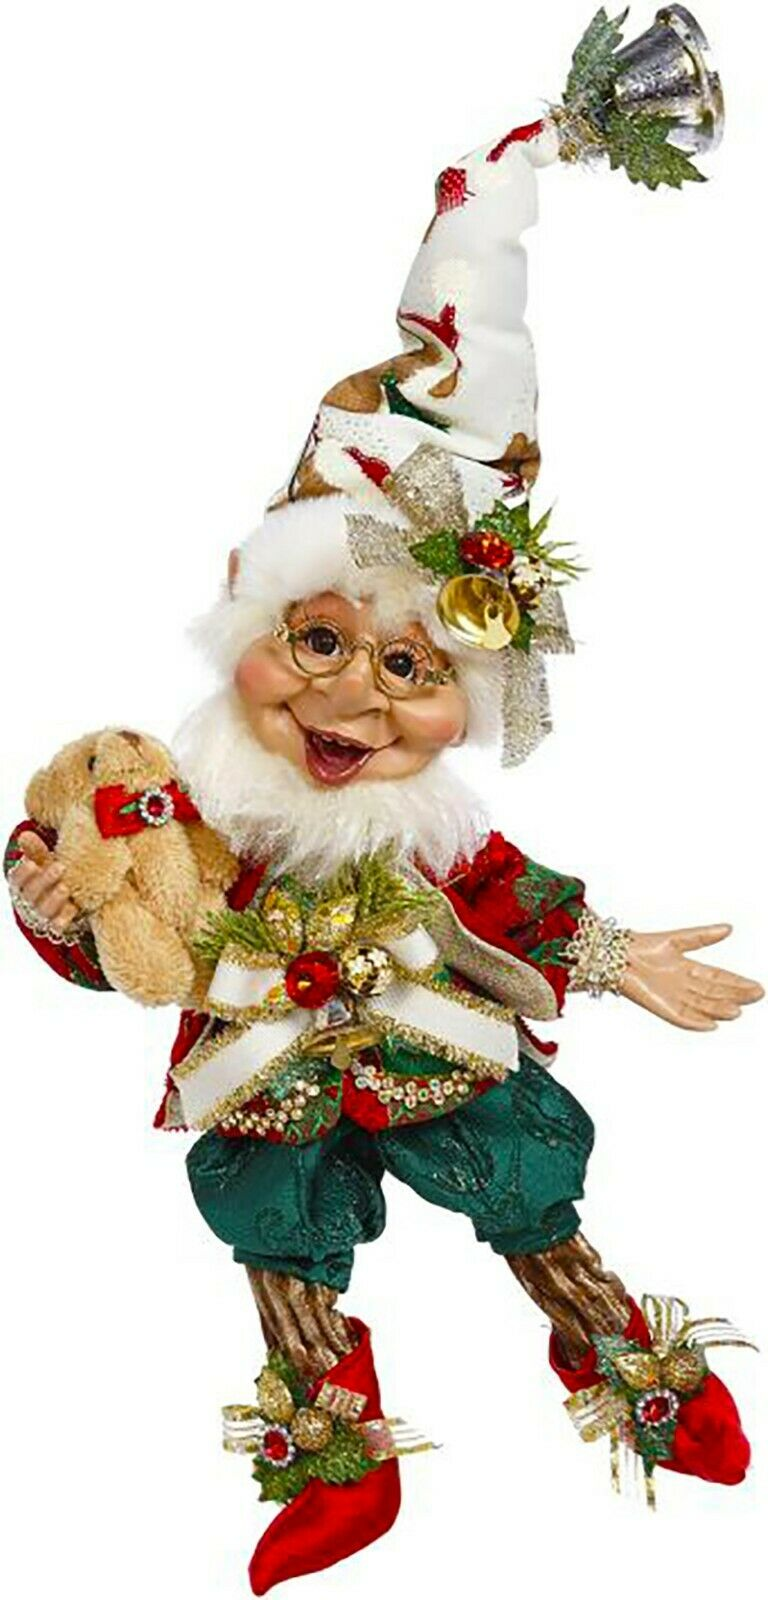 "[Mark Roberts Elves - Teddy Bear Elf 51-05544 Small 10.5"" Figurine </Title]"